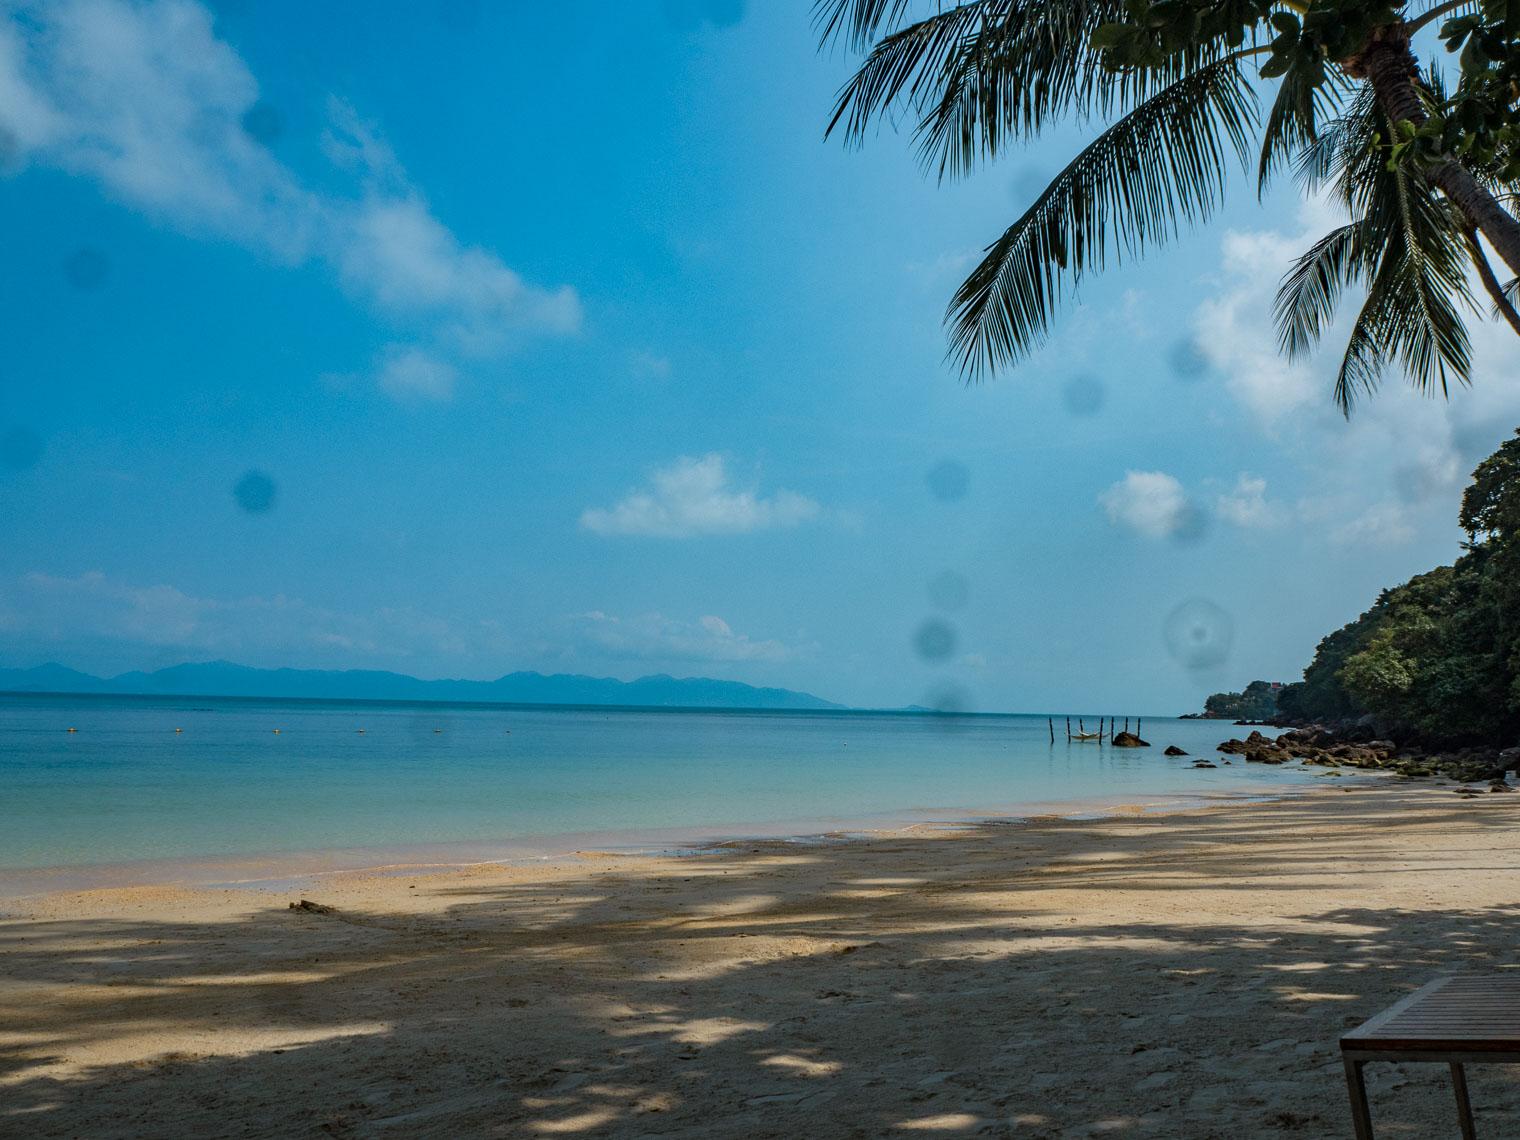 Private beach at Four Seasons resort Koh Samui